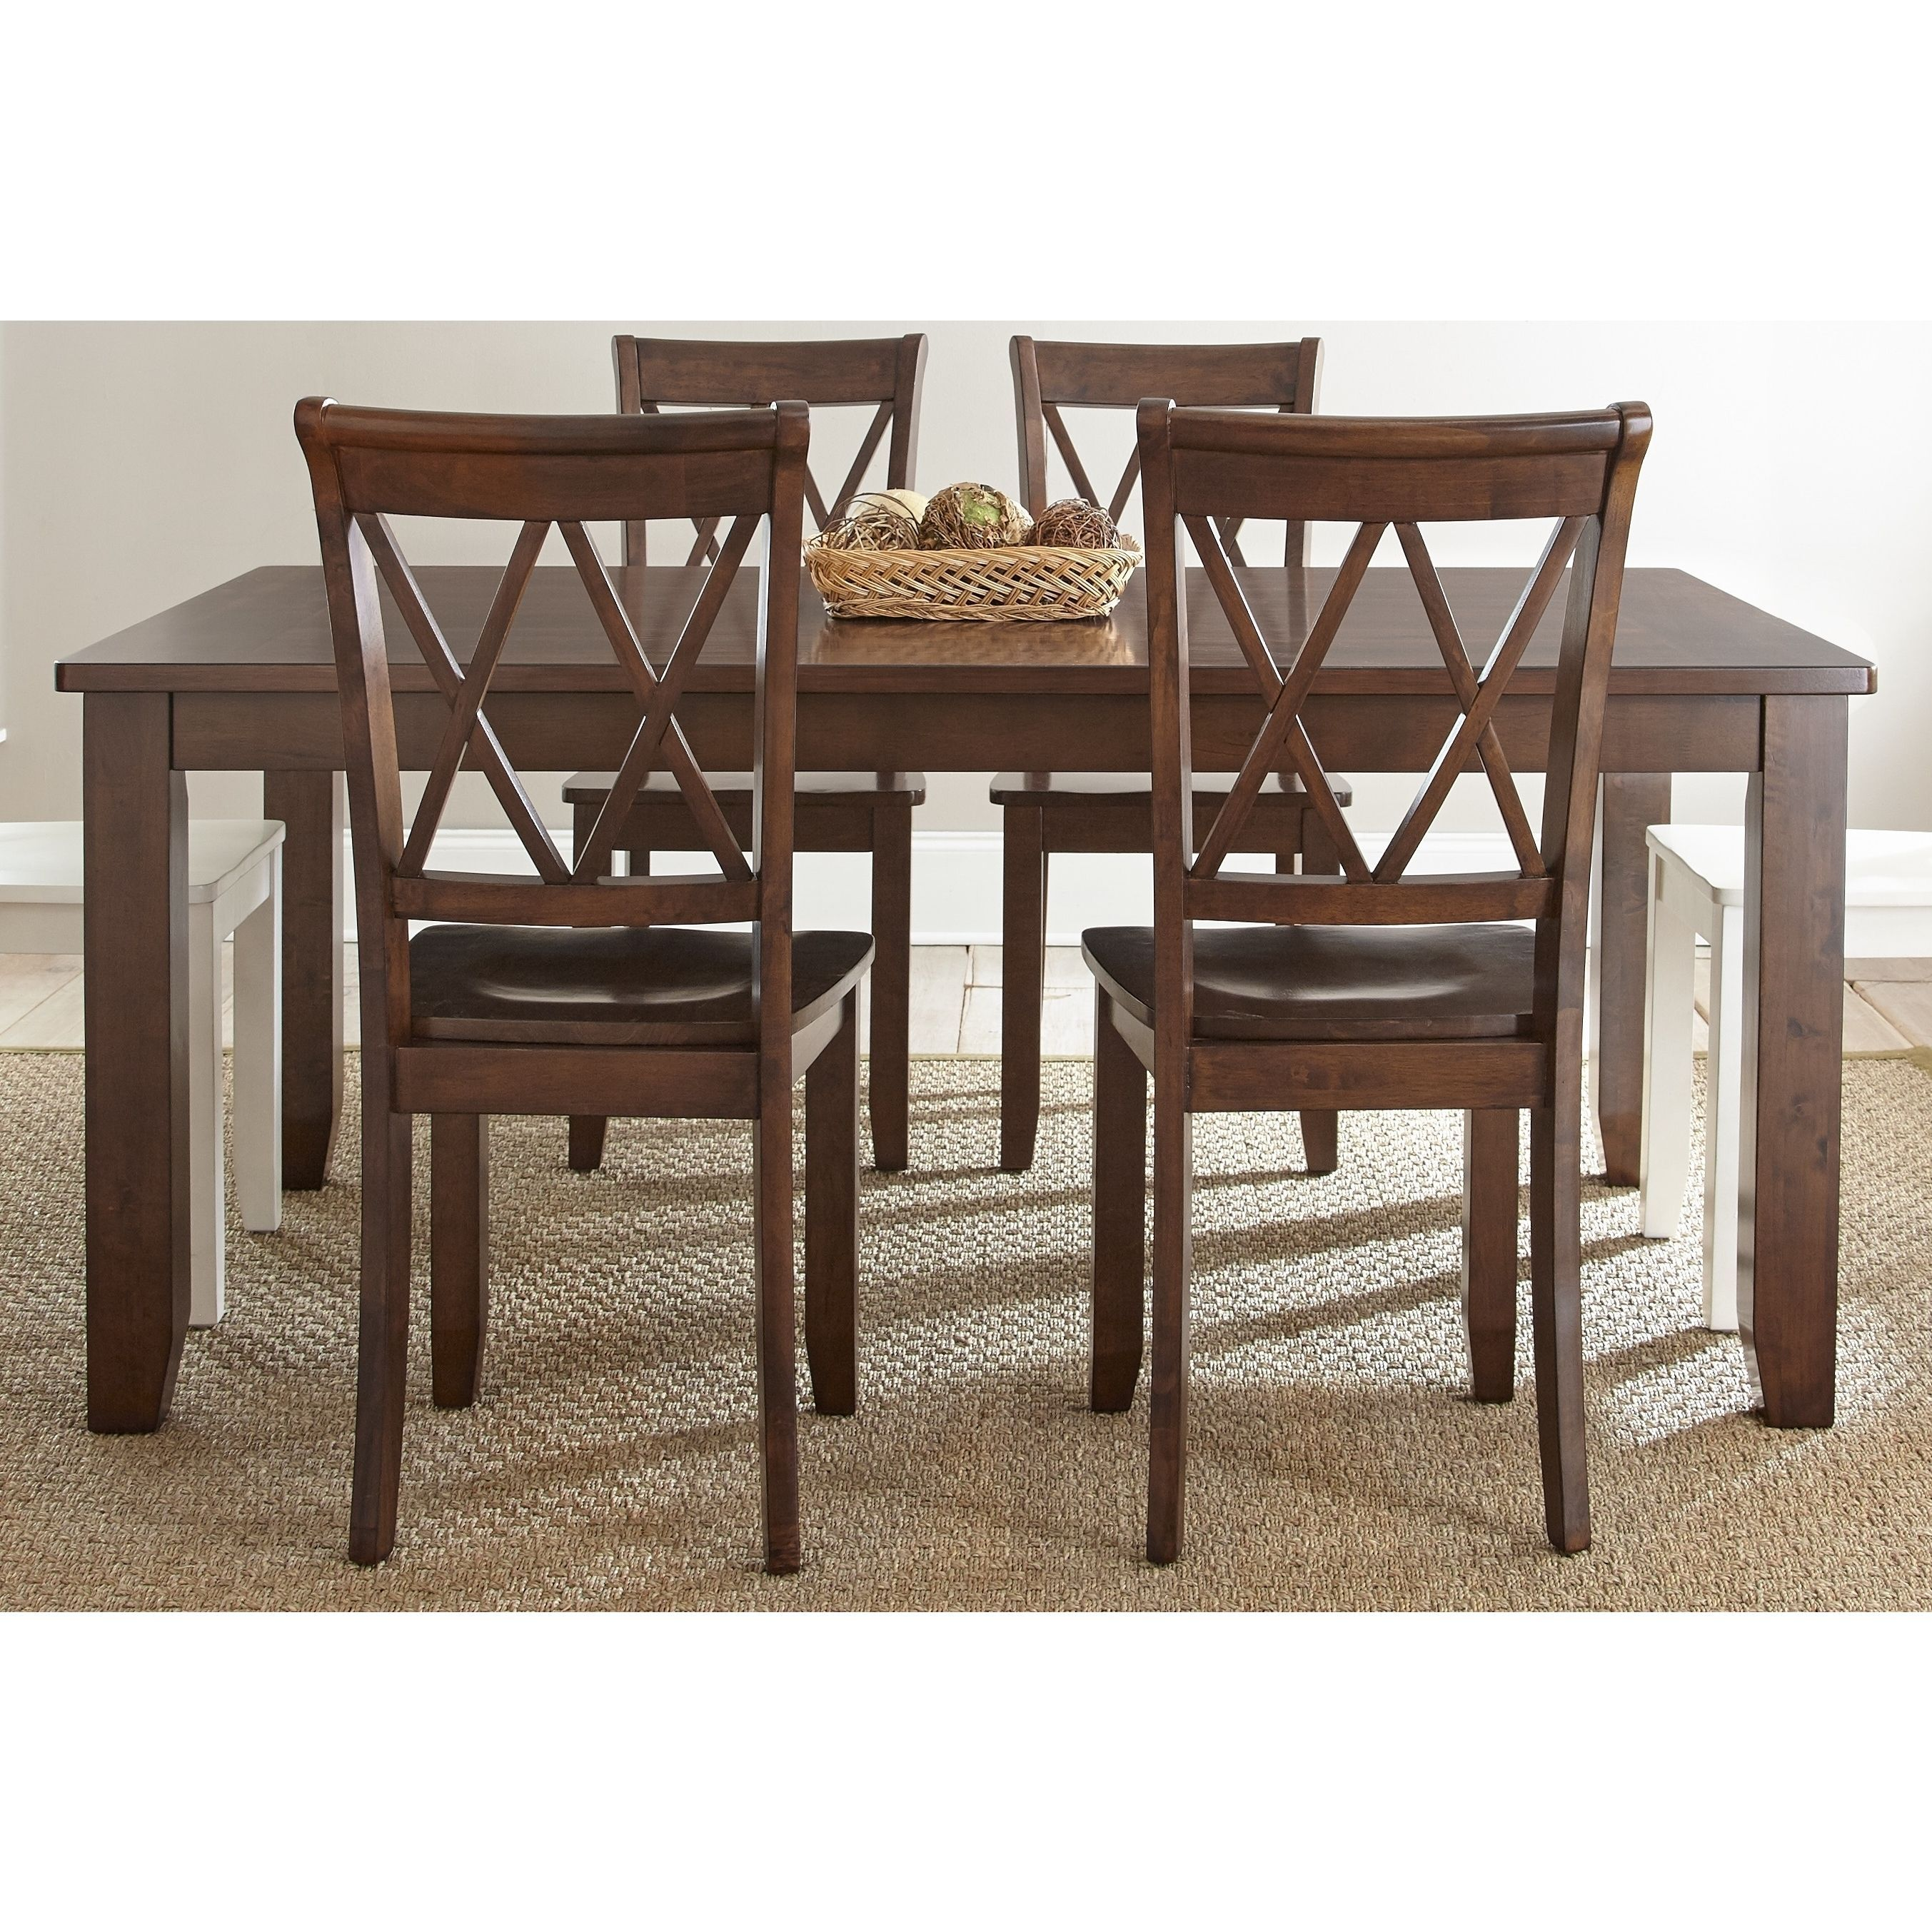 Greyson Living Aspen Fixed Top Dining Table (Aspen Dining Table),